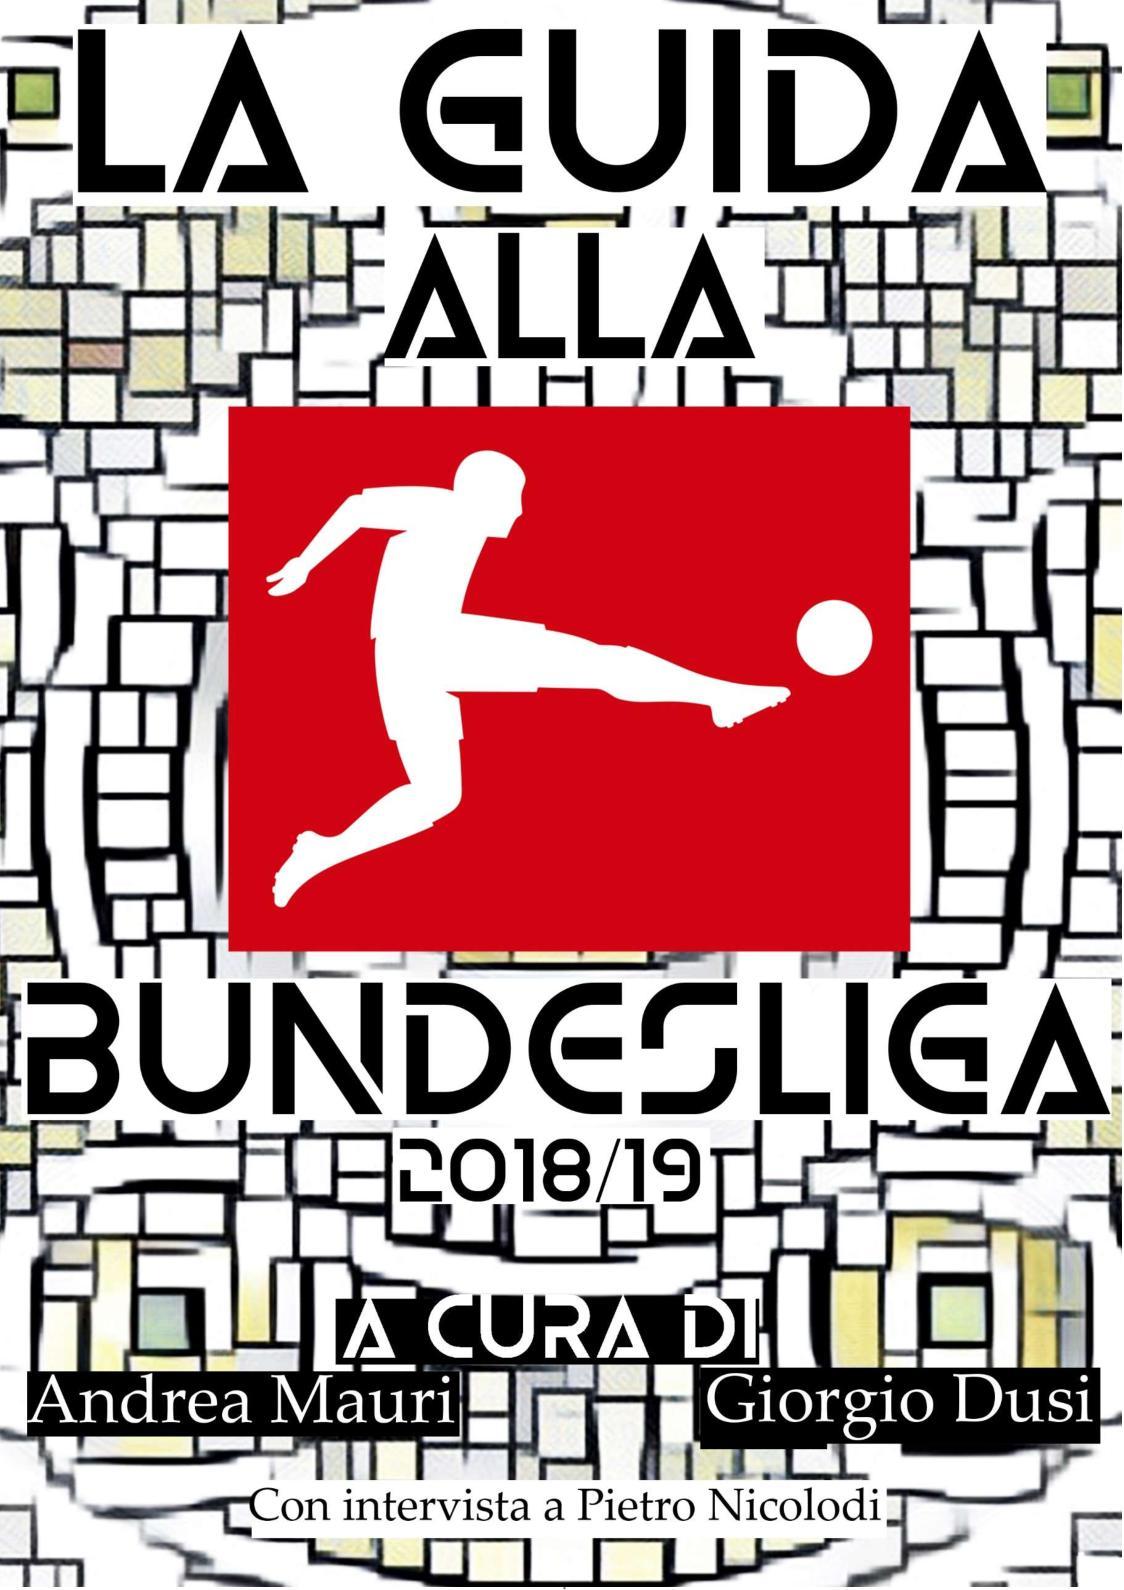 Terza Maglia Bayer 04 Leverkusen Tomasz Kucz